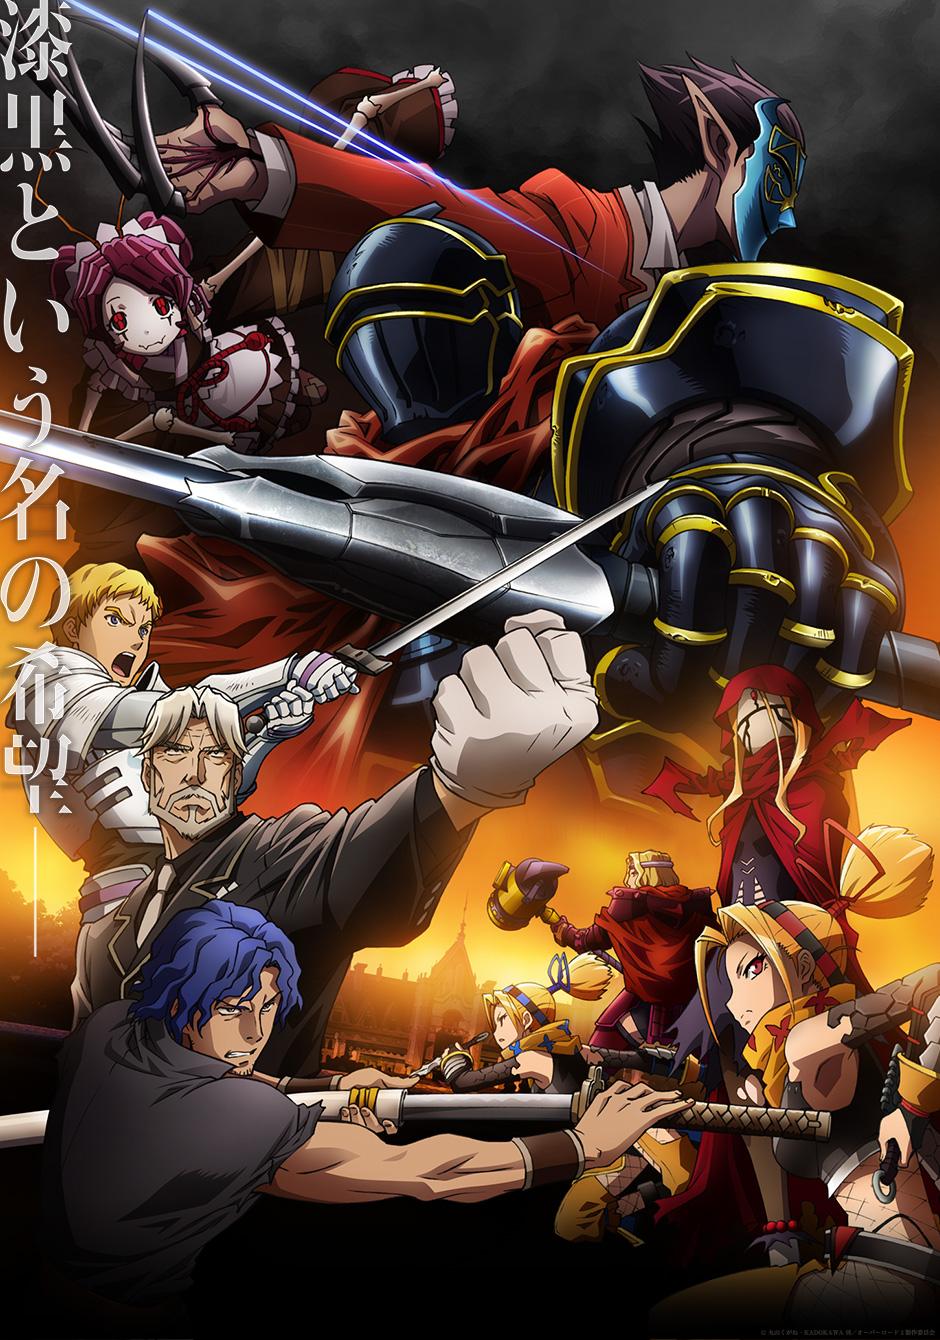 Brain Overlord Zerochan Anime Image Board